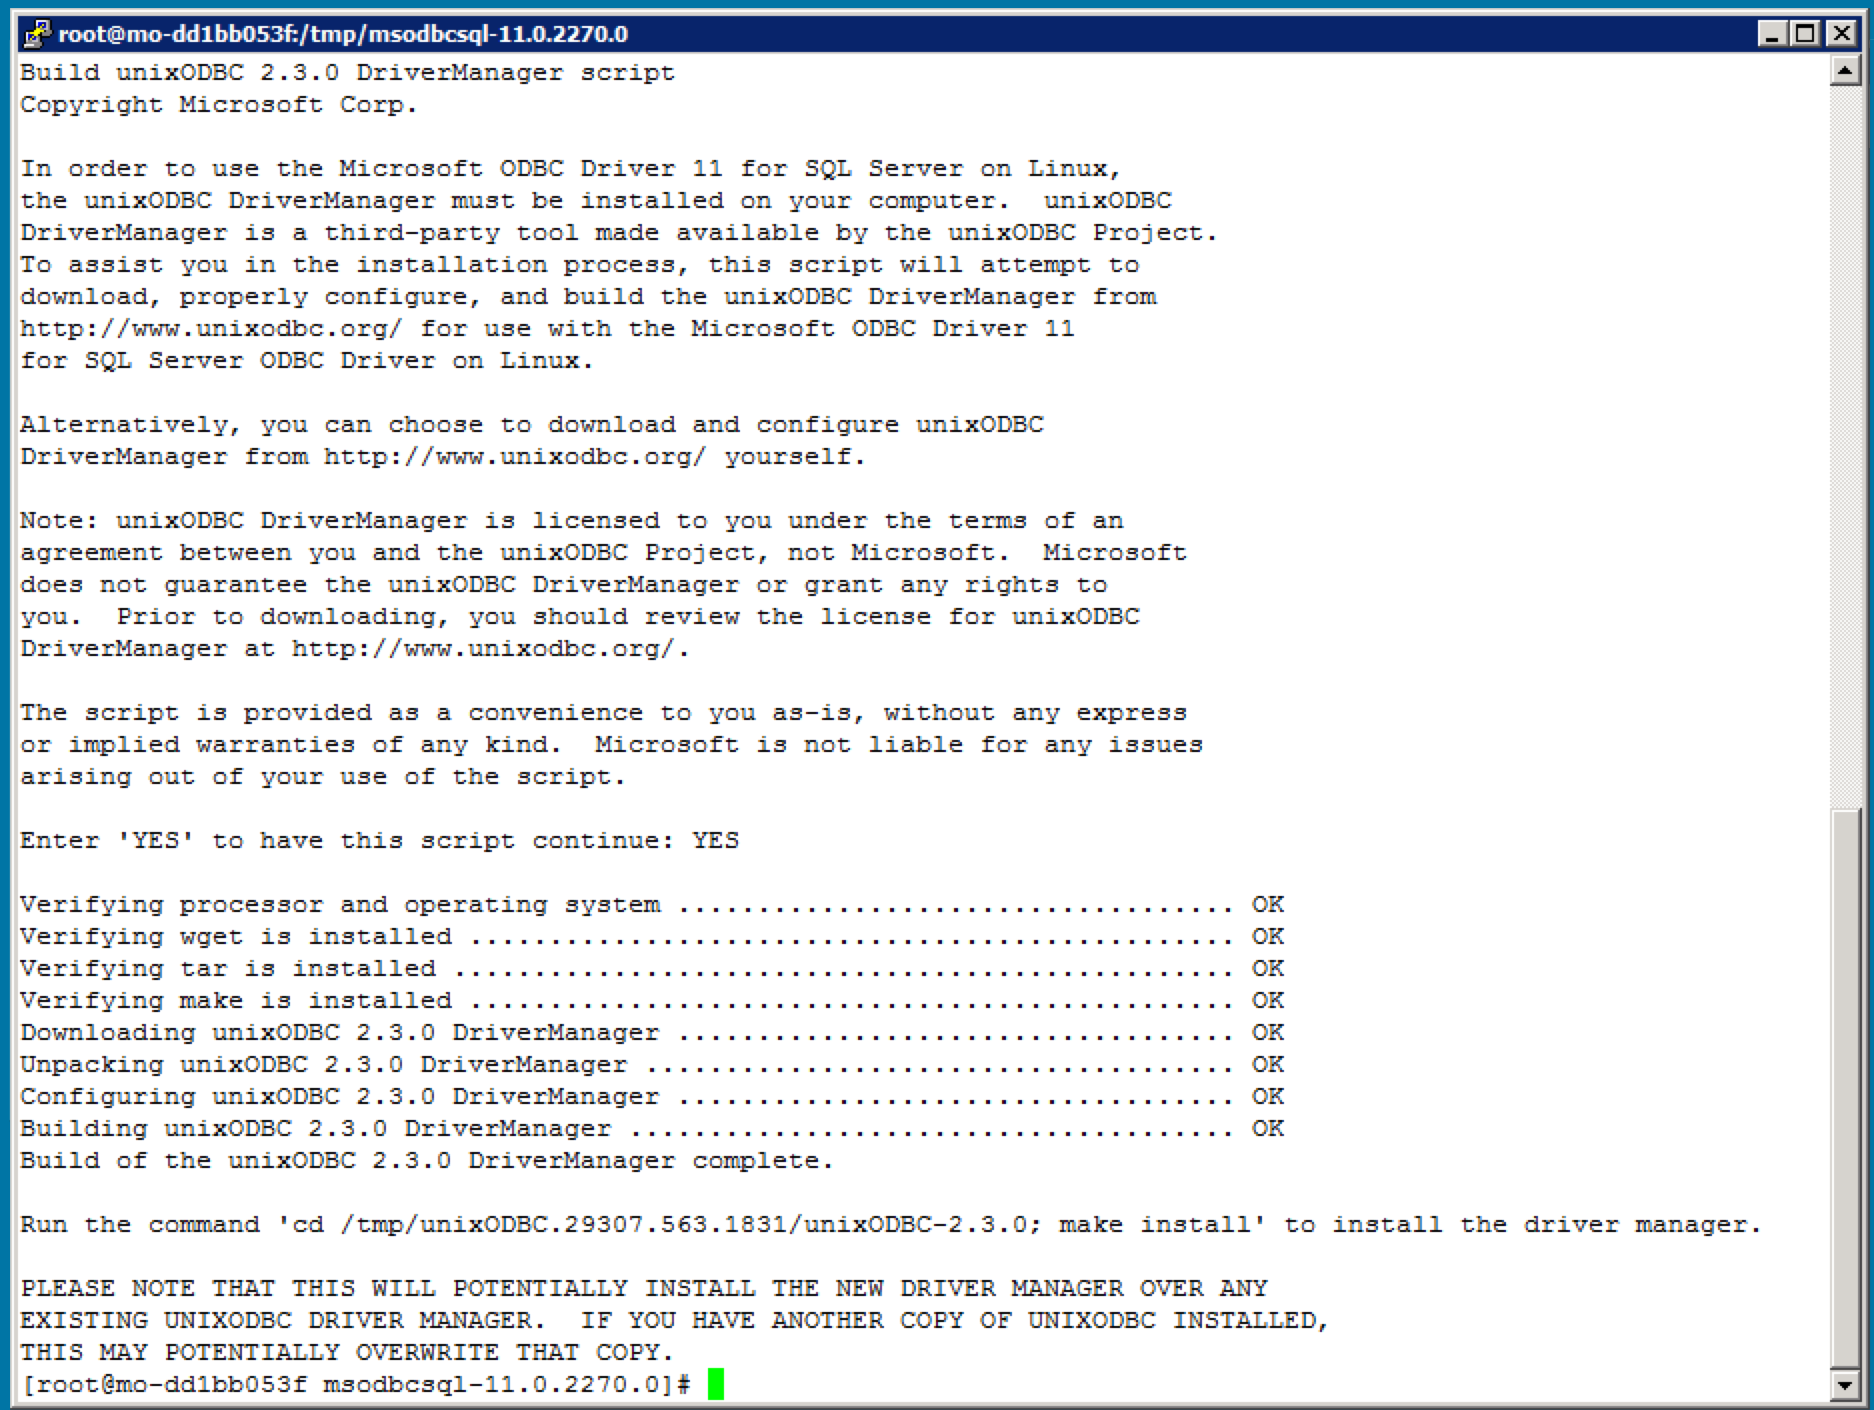 Microsoft ODBC Driver for SQL Server on Linux – by the SAP HANA